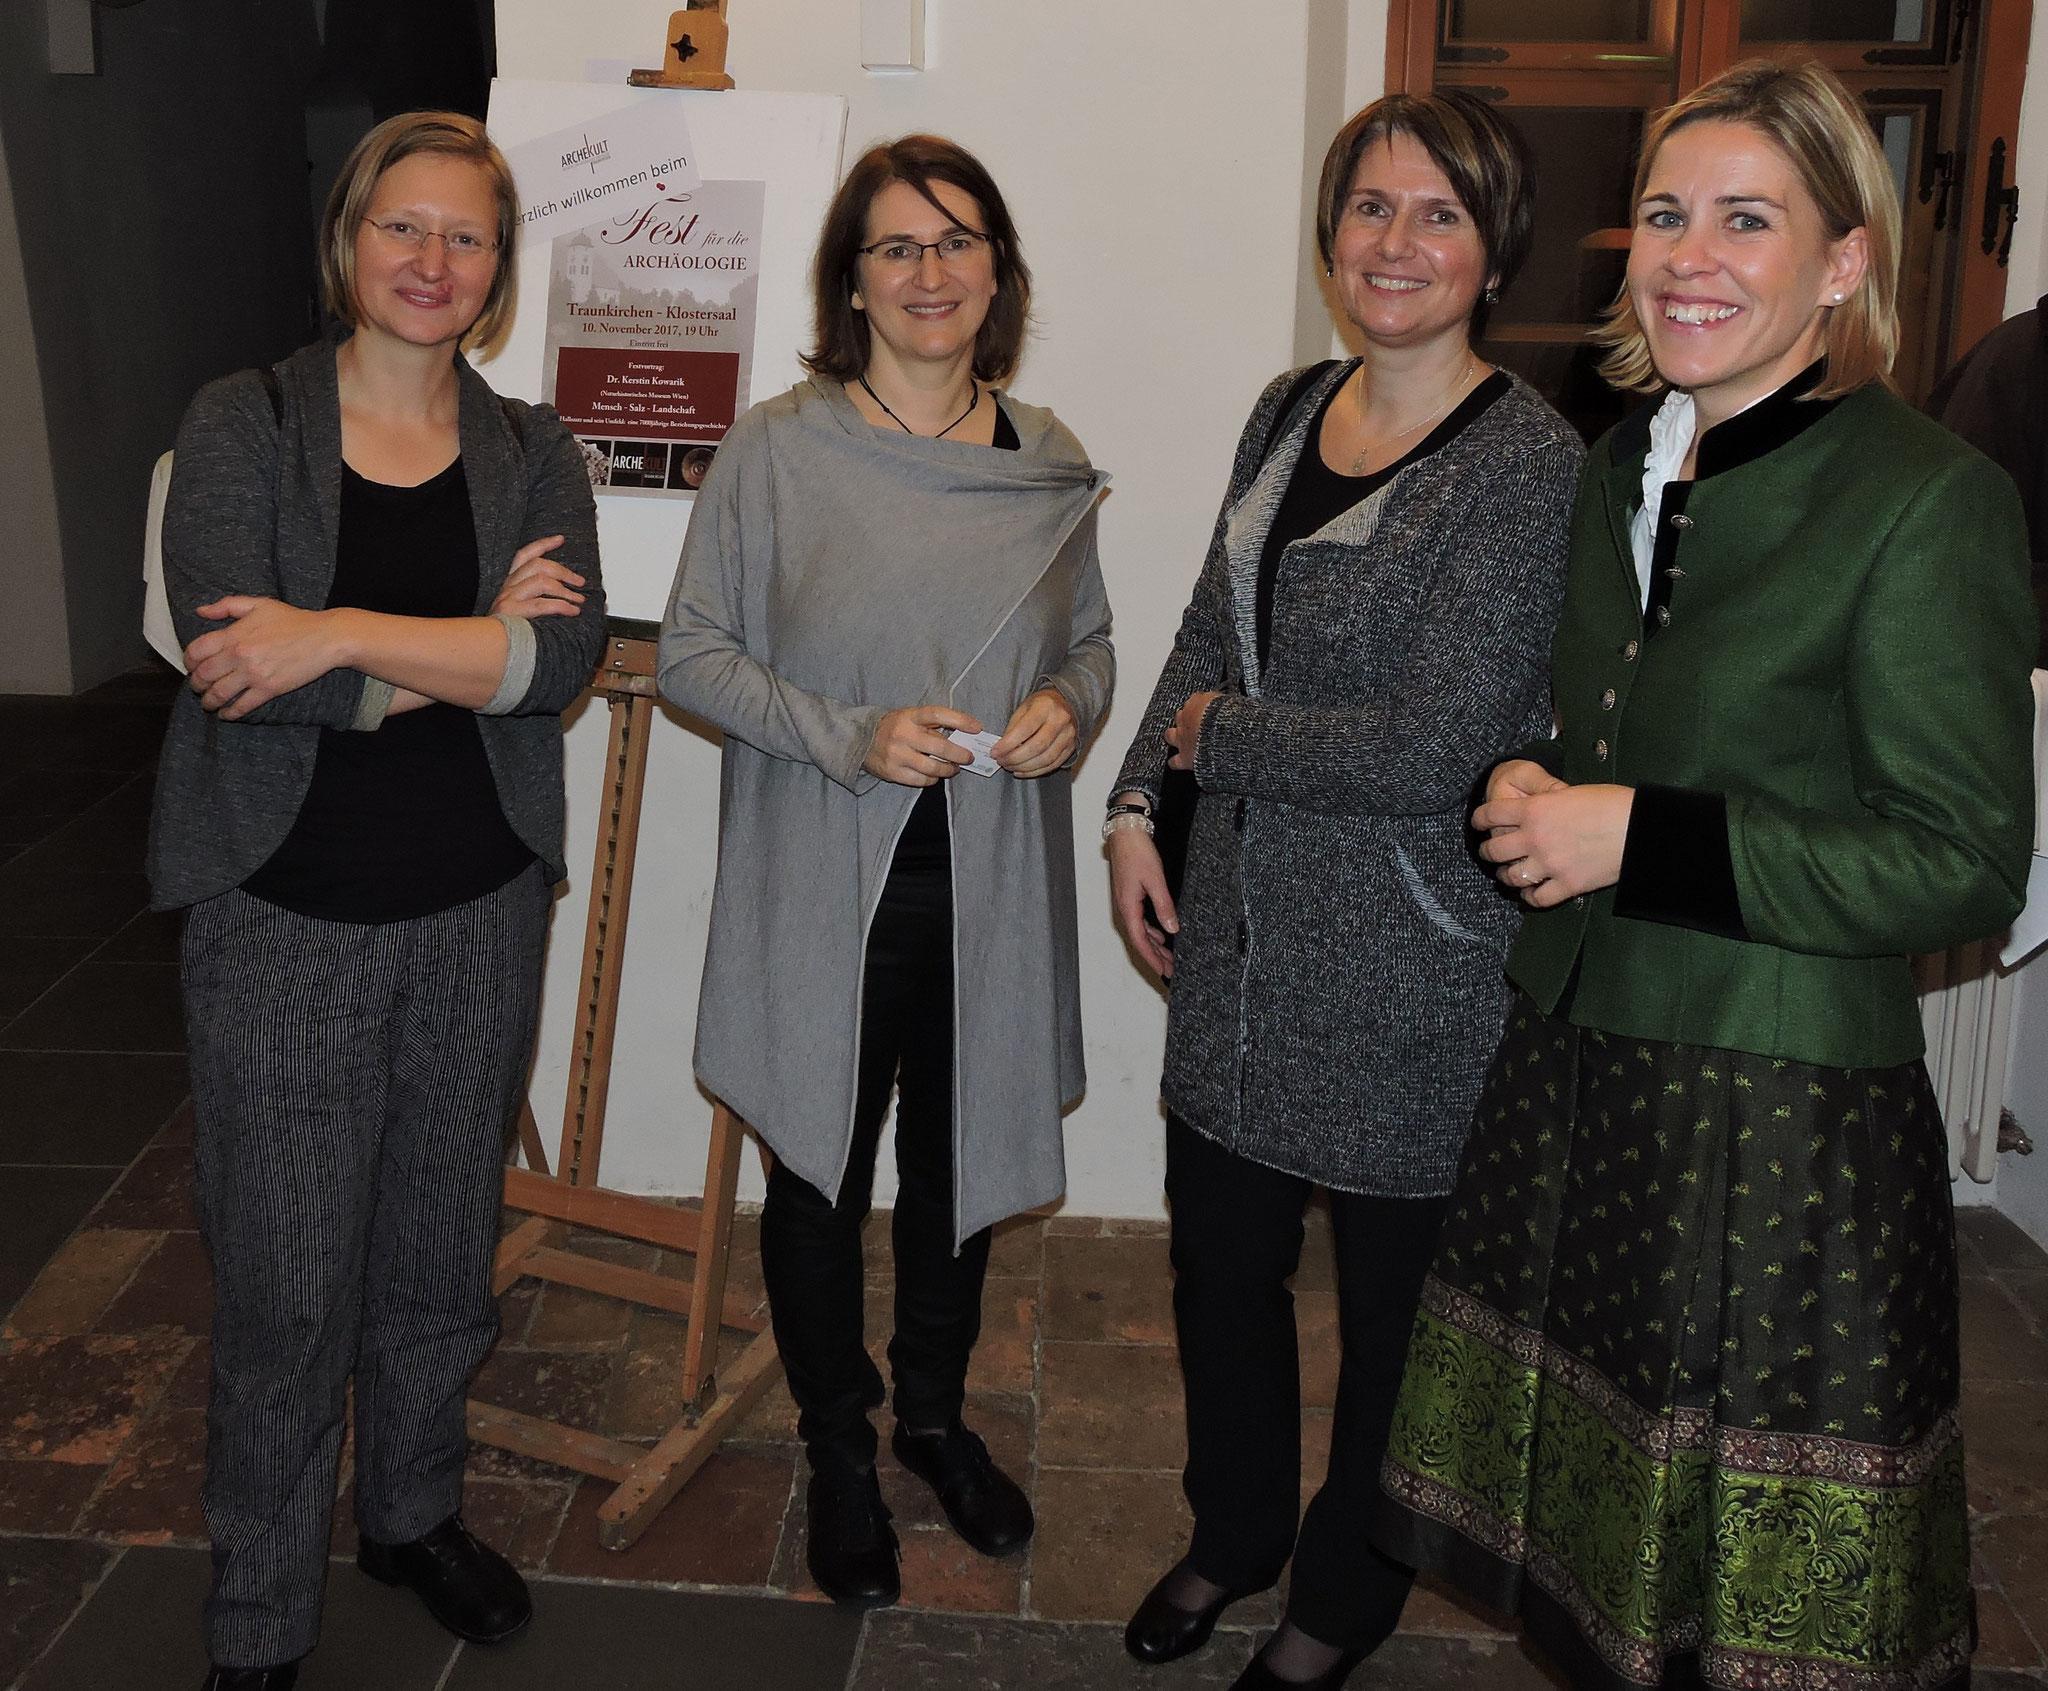 Kerstin Kowarik, Beate Kirchner, Sonja Hofer, Iris Wolf ©B. Bichler